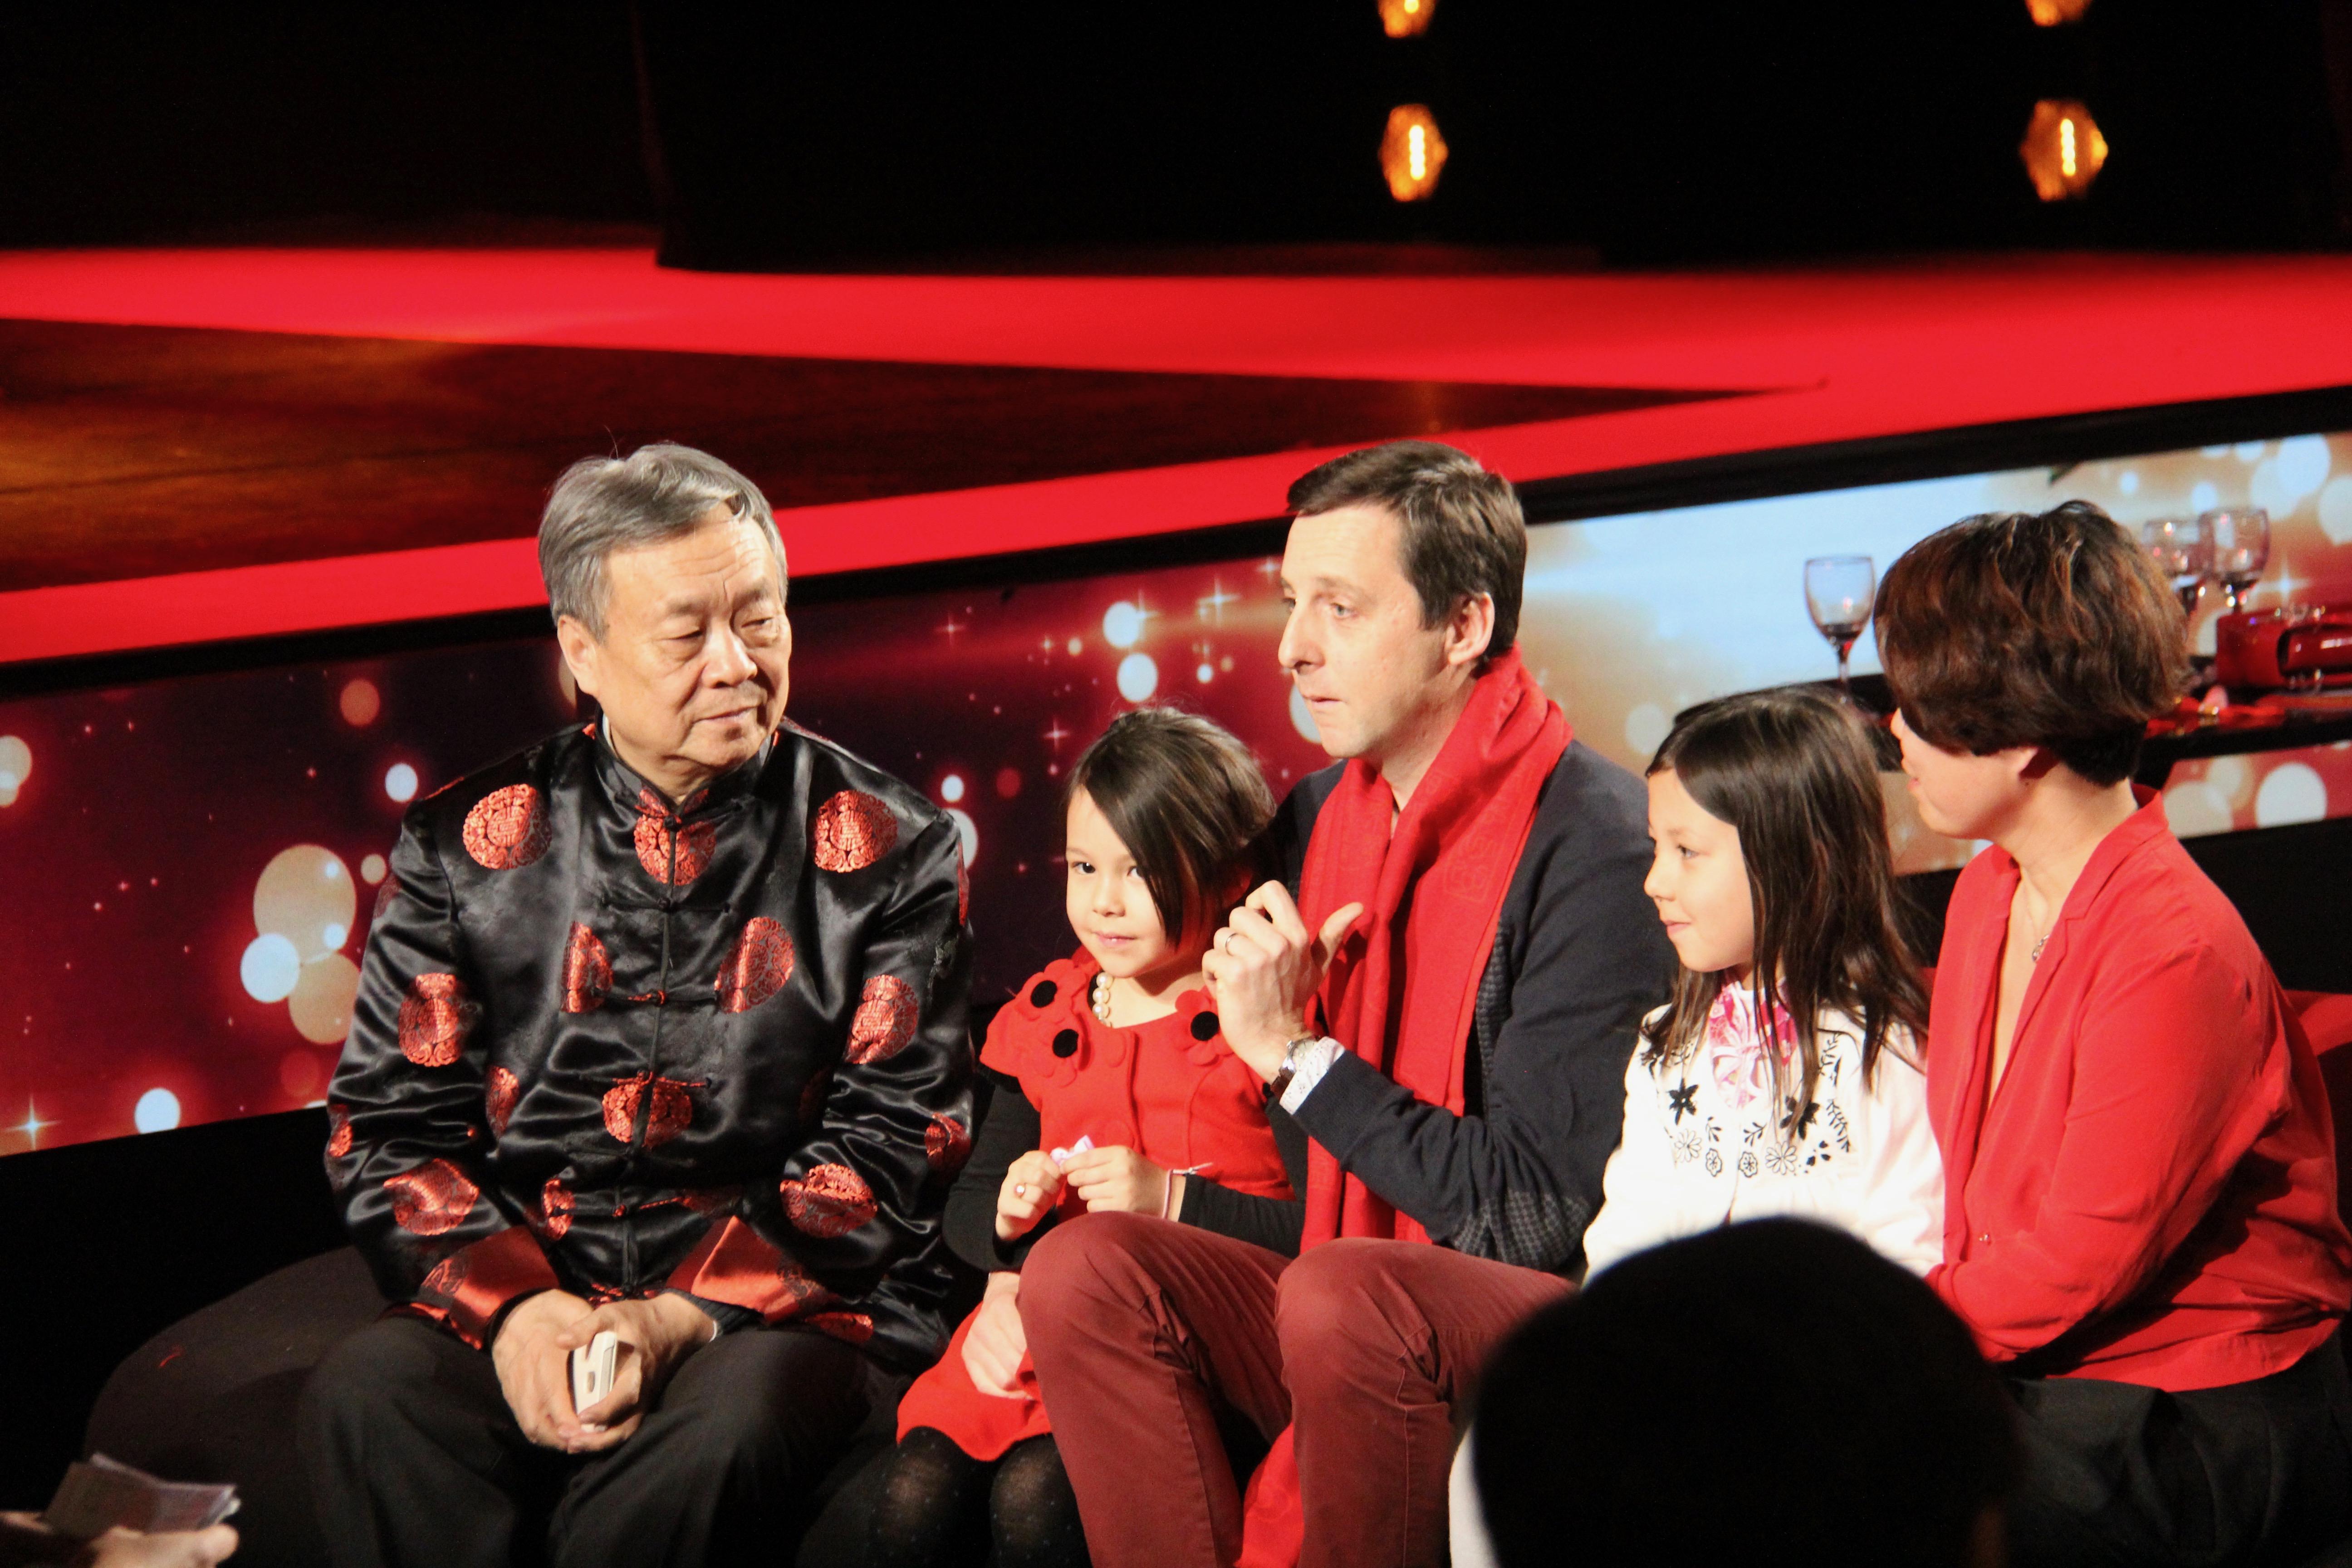 Paris gala marks 55th anniversary of Sino-French ties